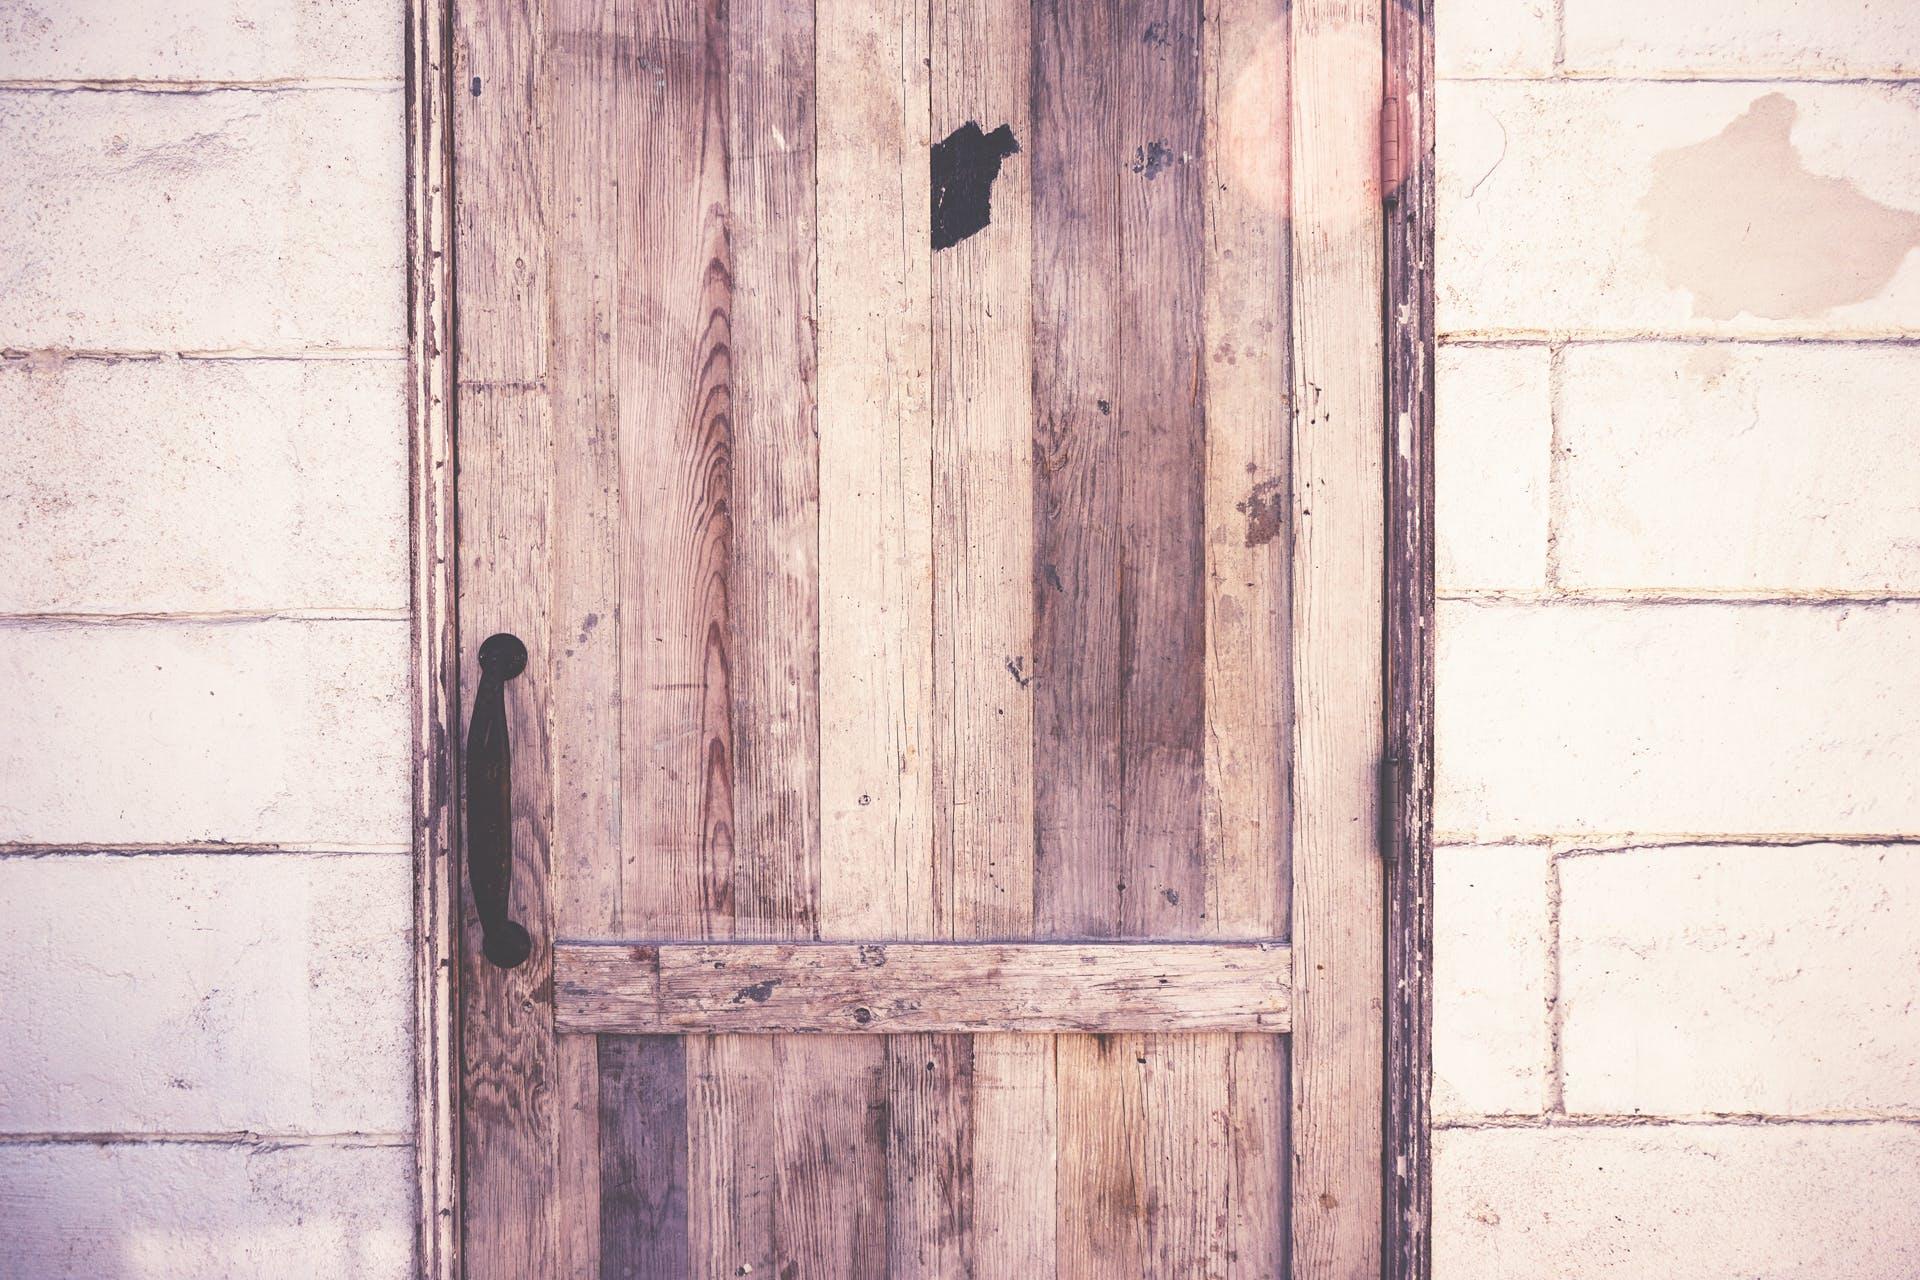 Free stock photo of door, rustic, closed